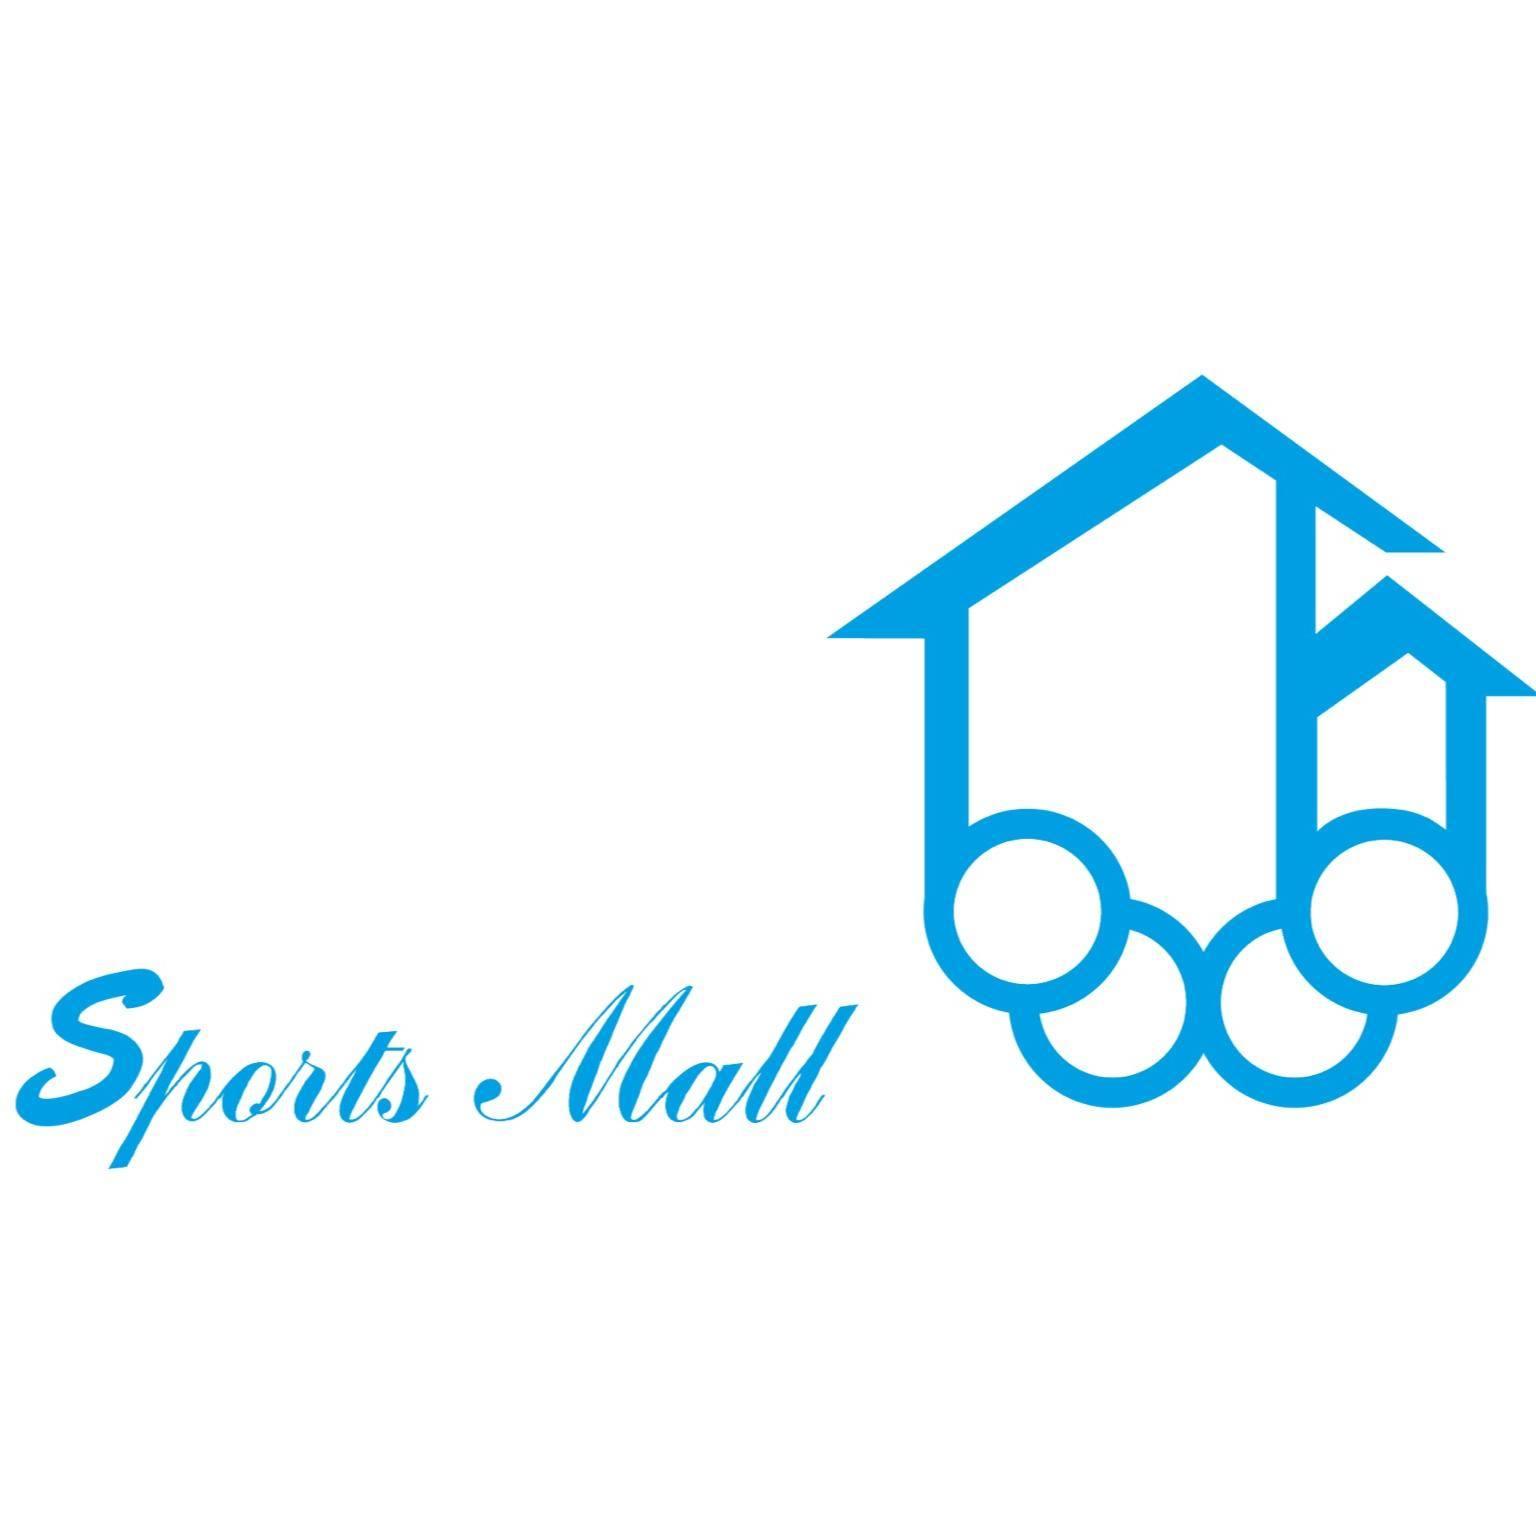 سبورتس مول Sports Mall